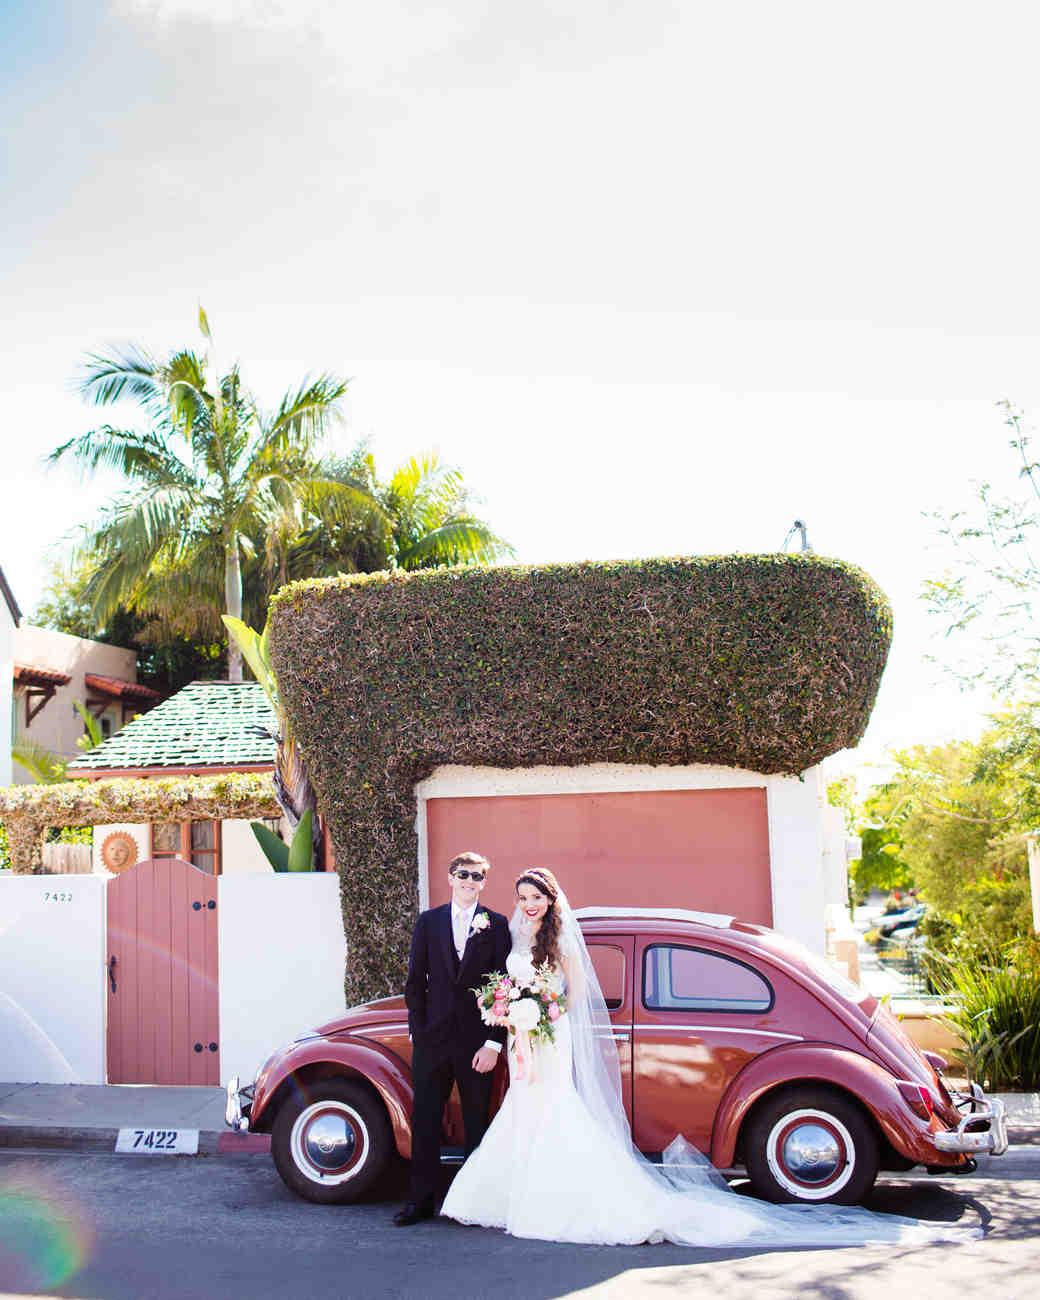 richelle-tom-wedding-car-545-s112855-0416.jpg